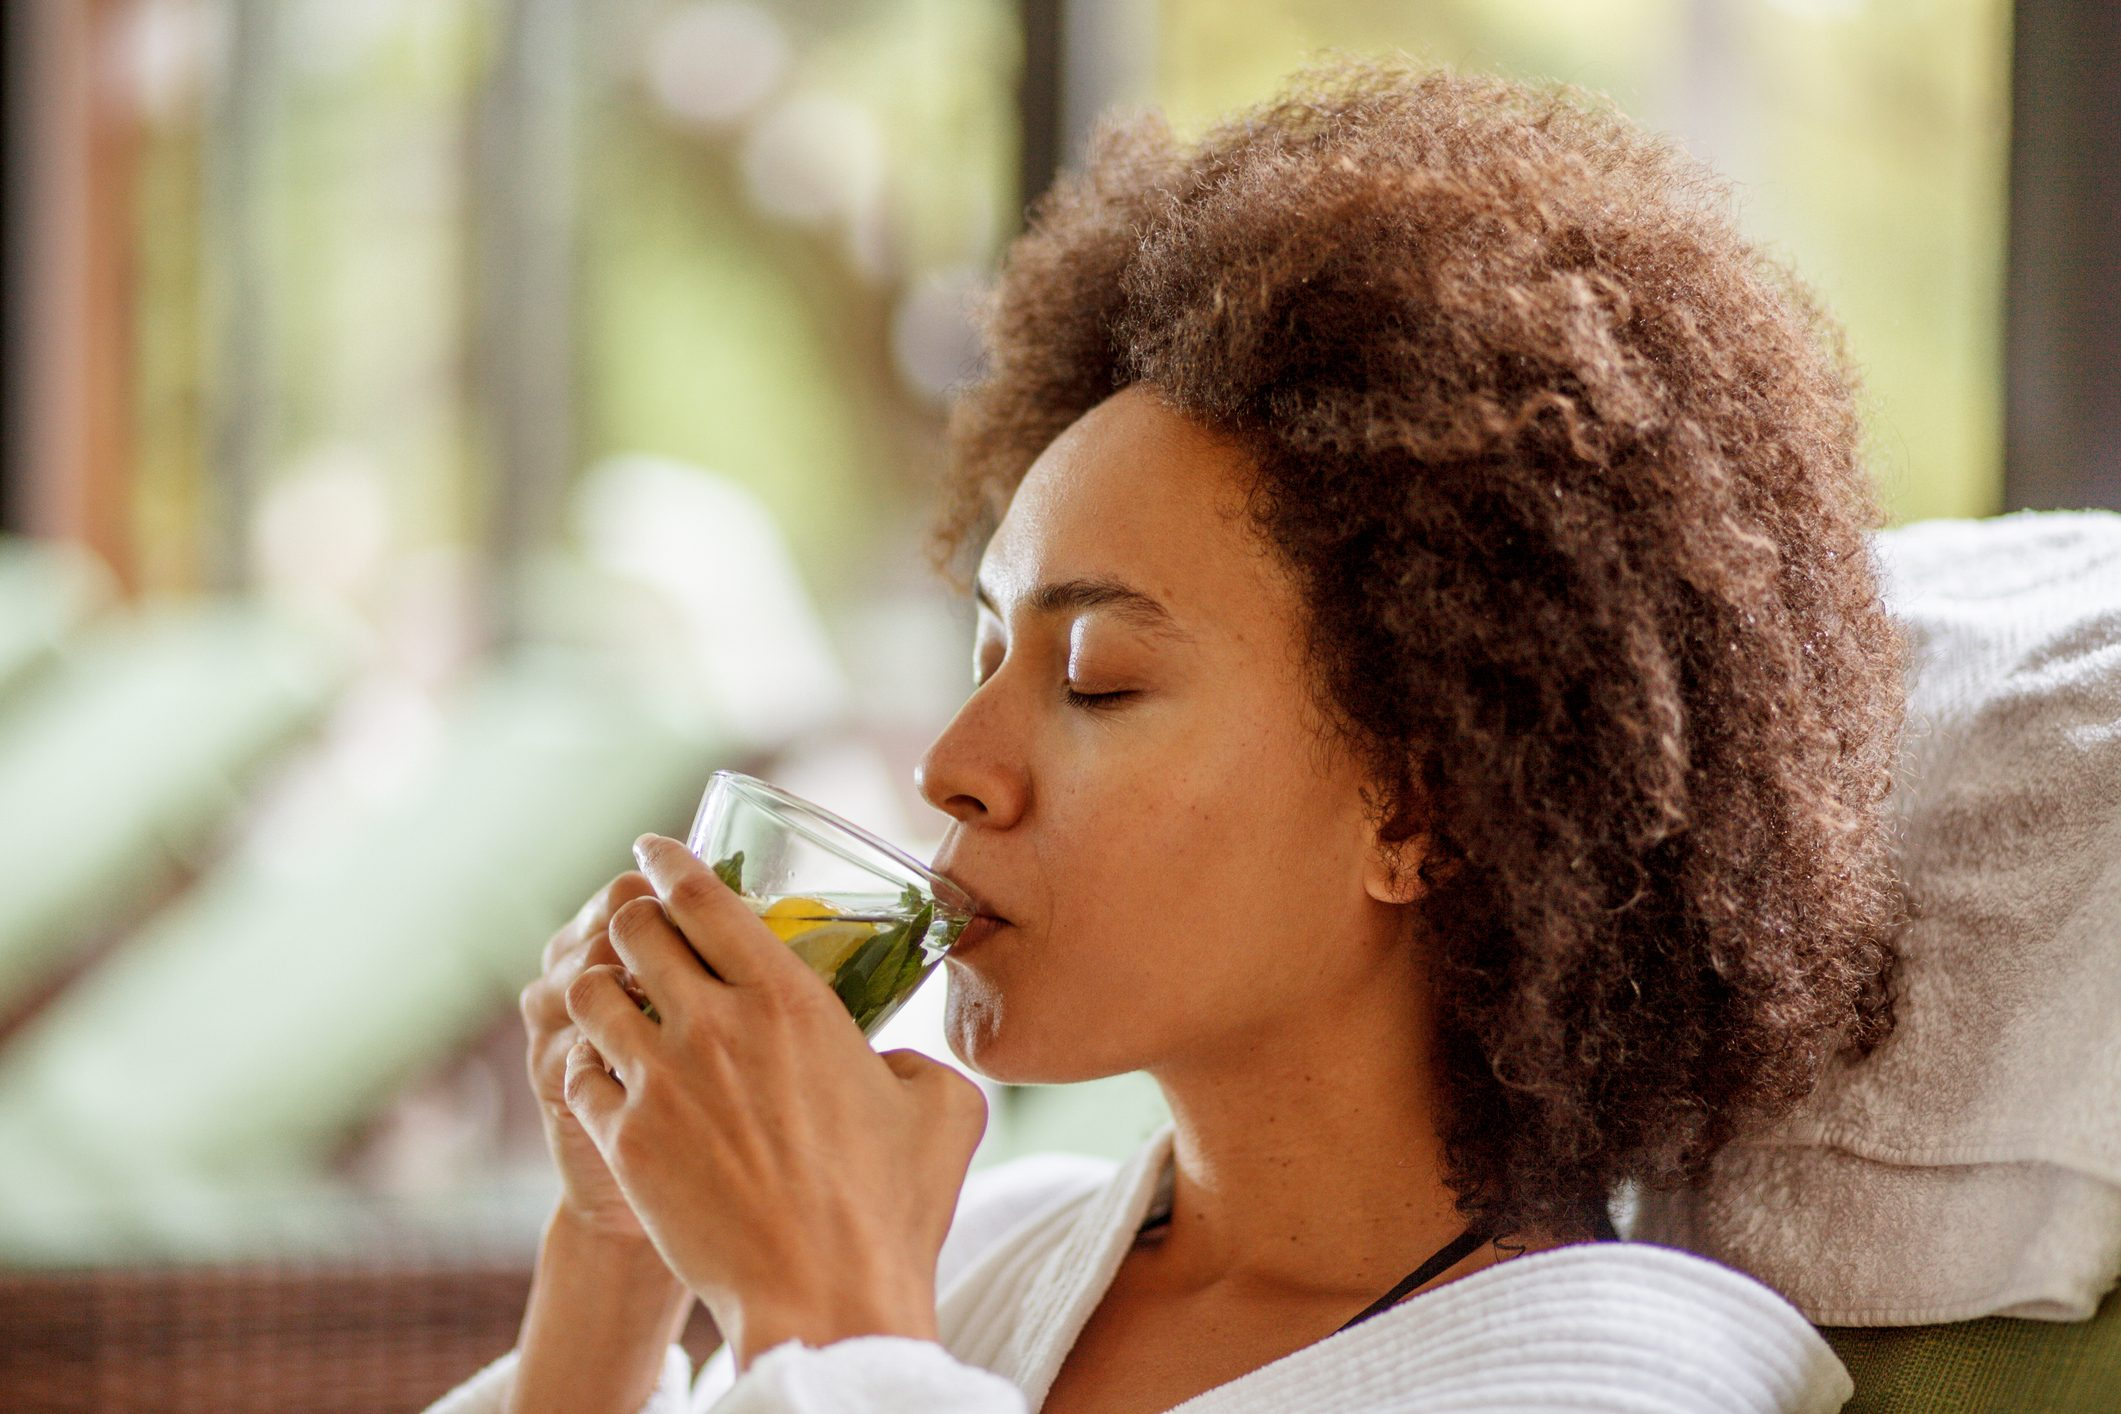 Drinking herbal tea at the wellness resort